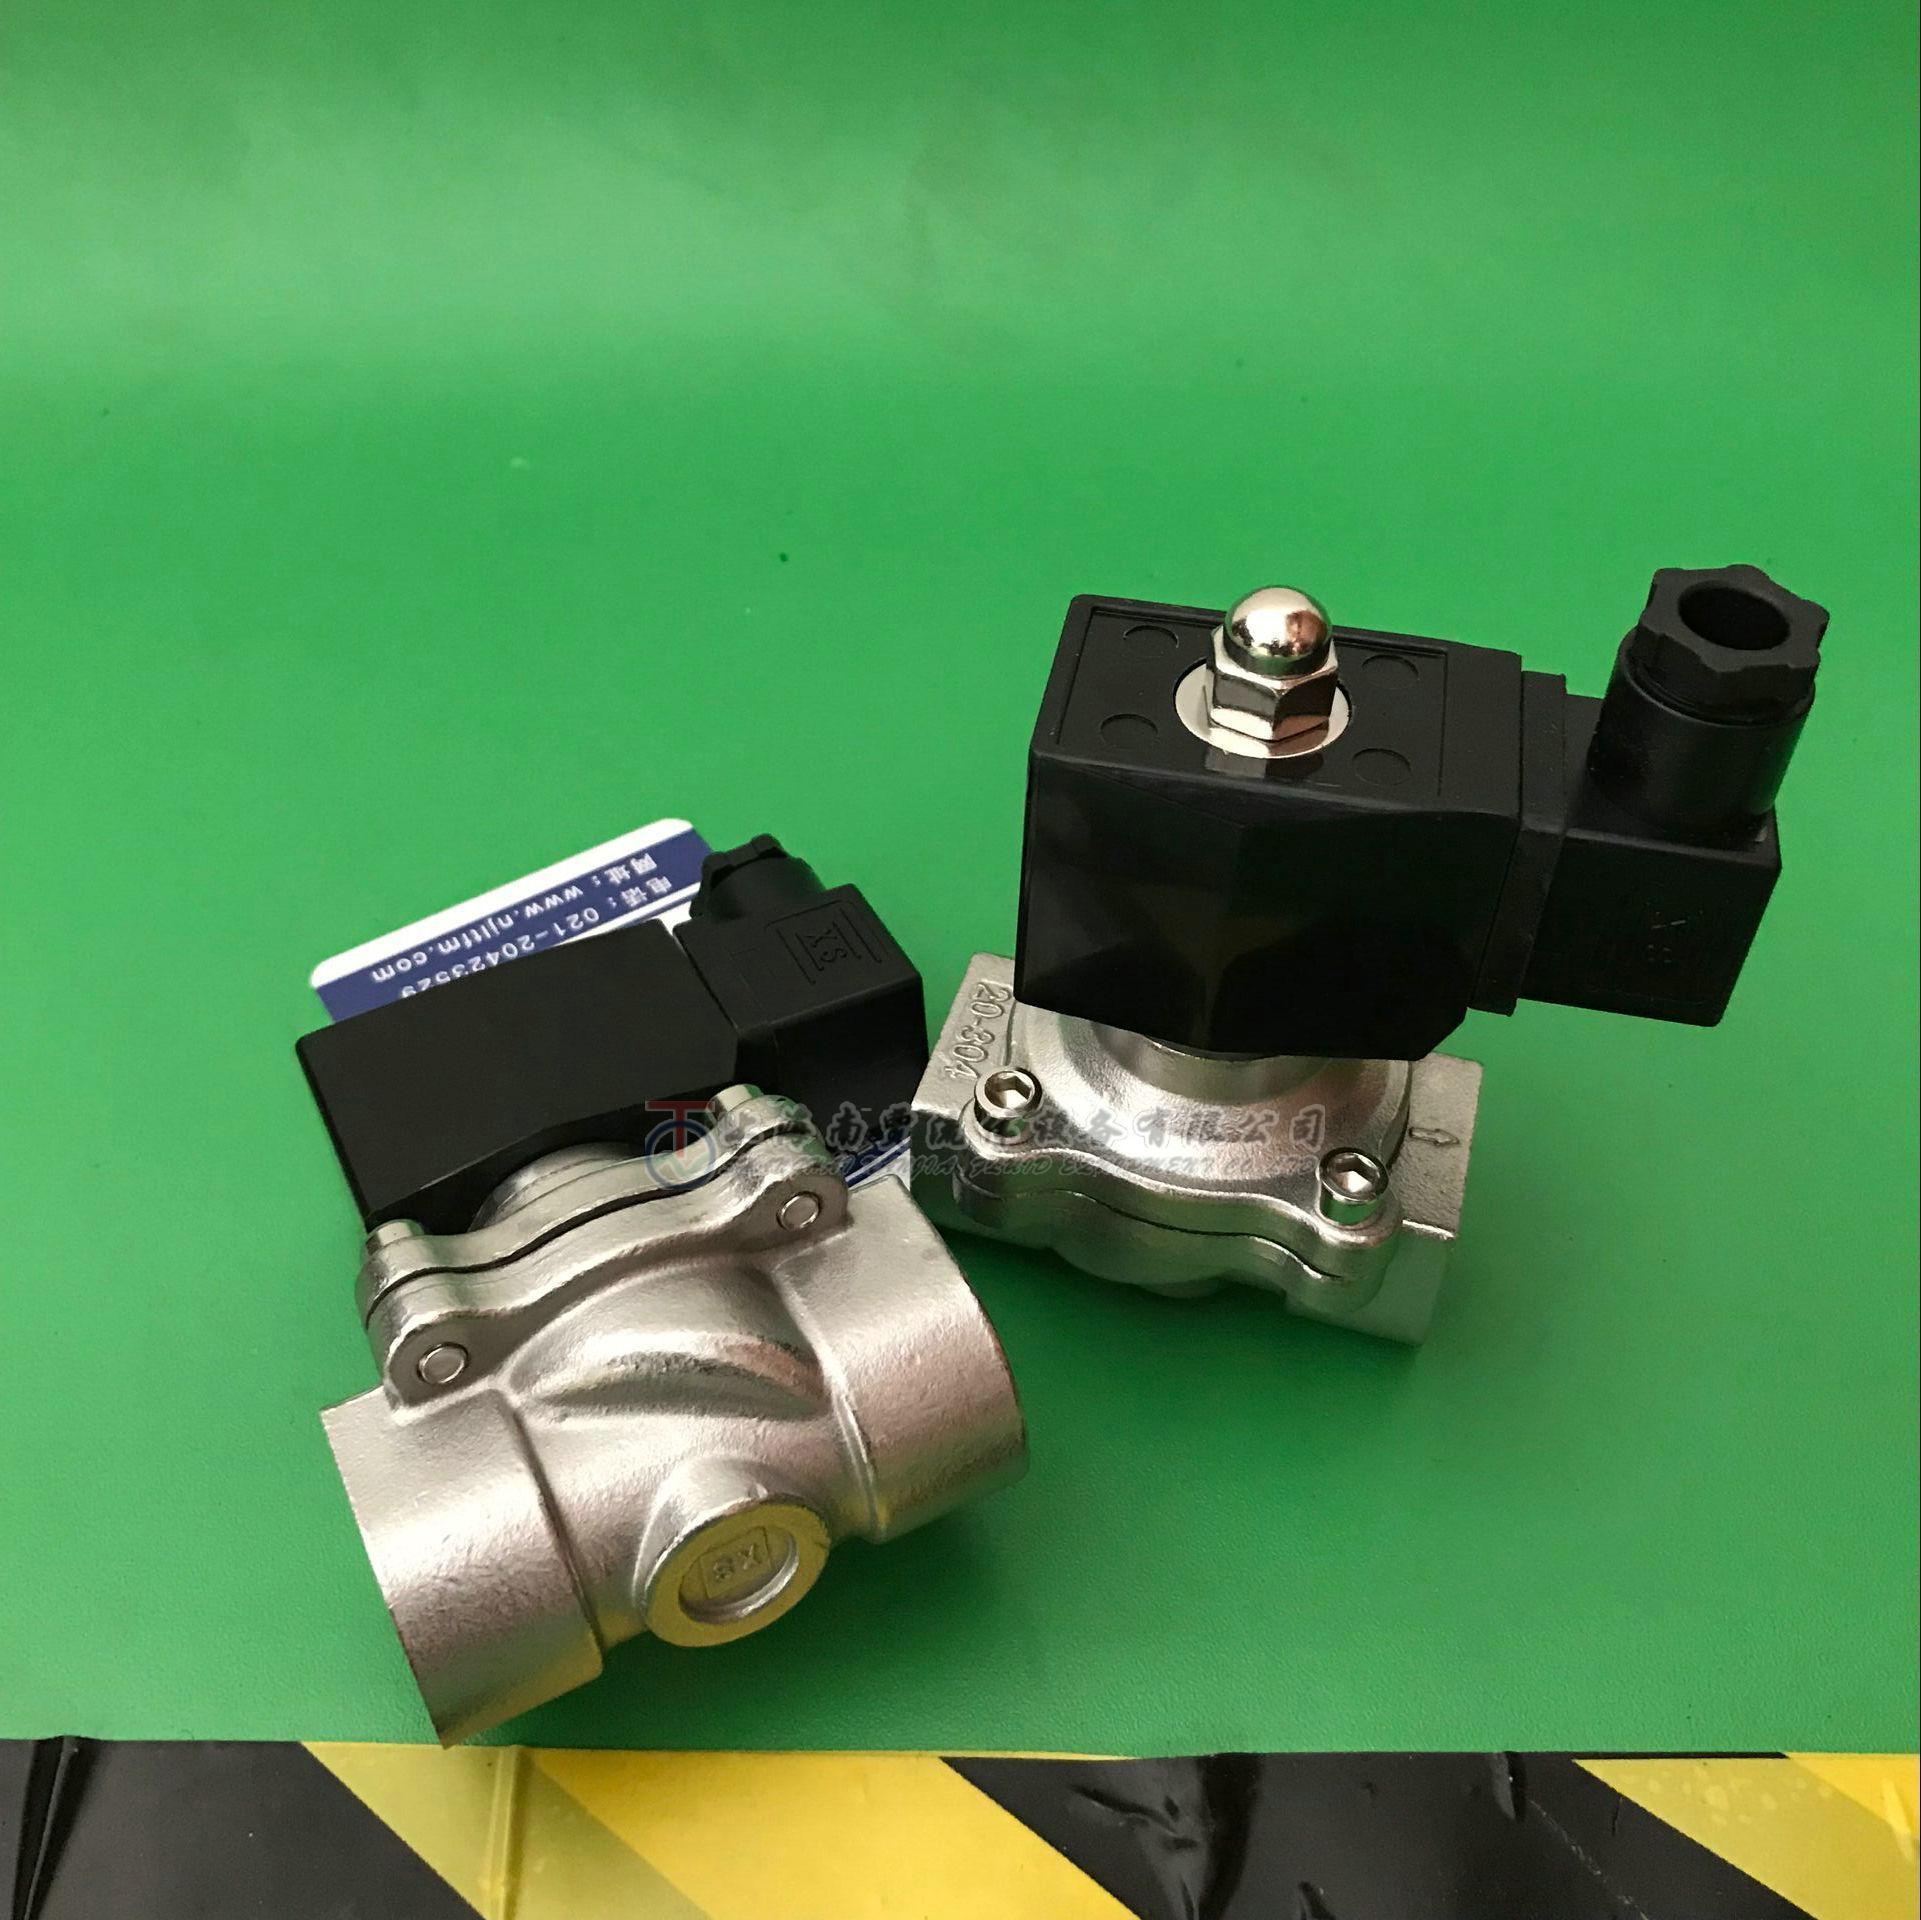 220v dn8-50 不锈钢常开闭两通空气泵电磁阀 zca-10s图片